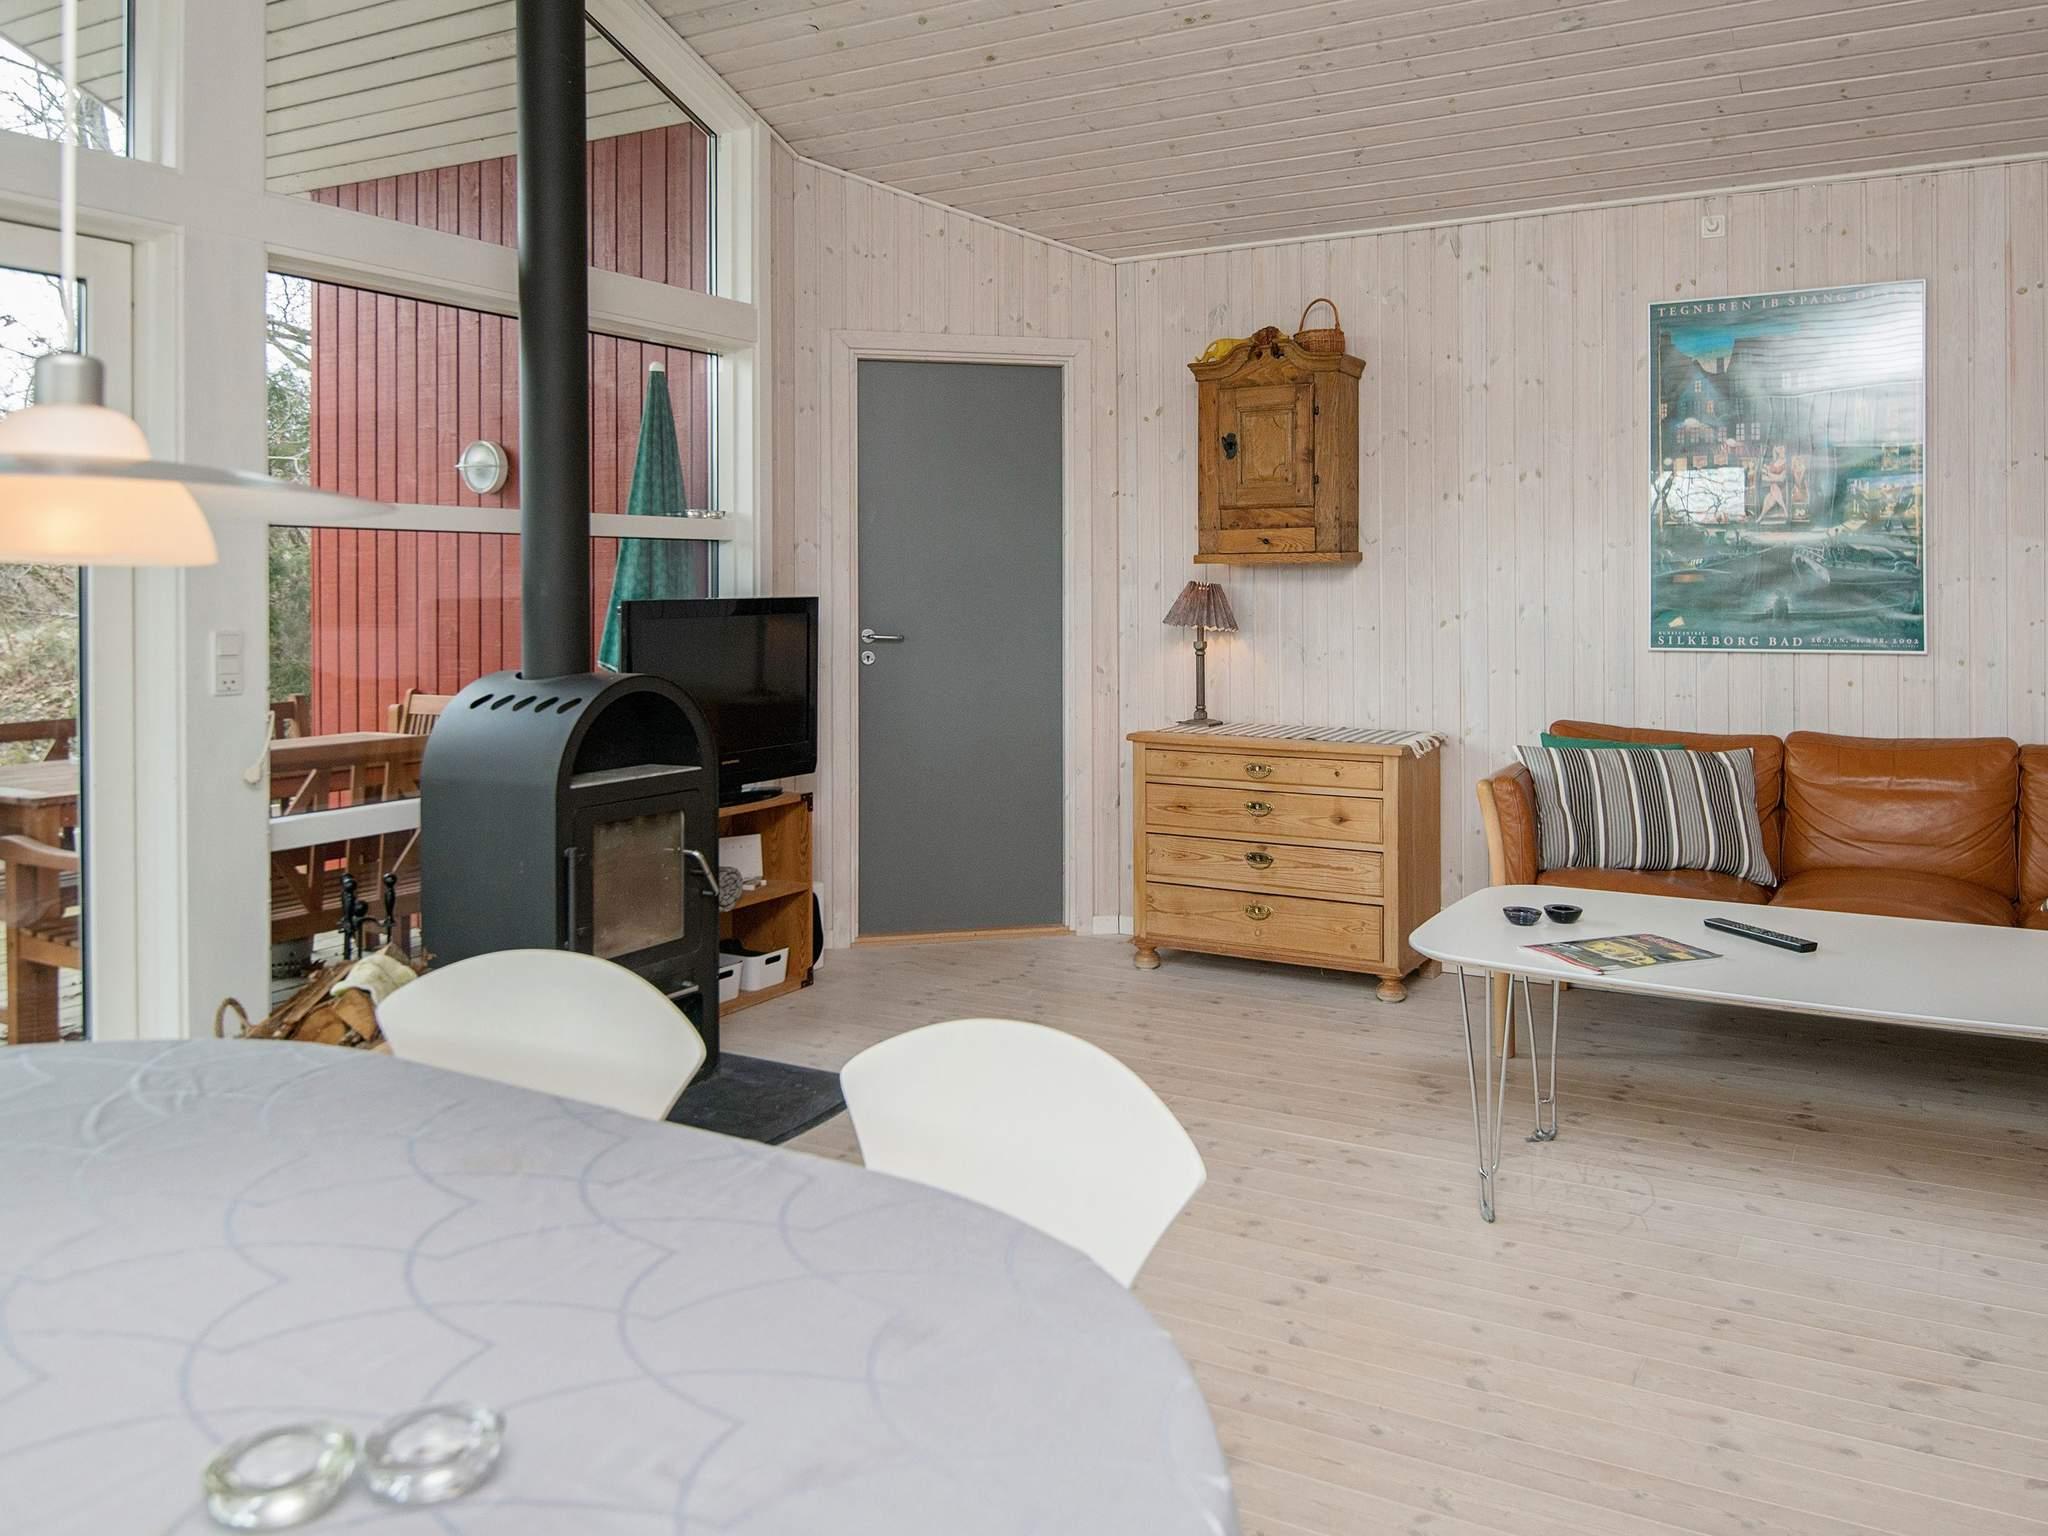 Ferienhaus Fjellerup Strand (125856), Fjellerup, , Ostjütland, Dänemark, Bild 4